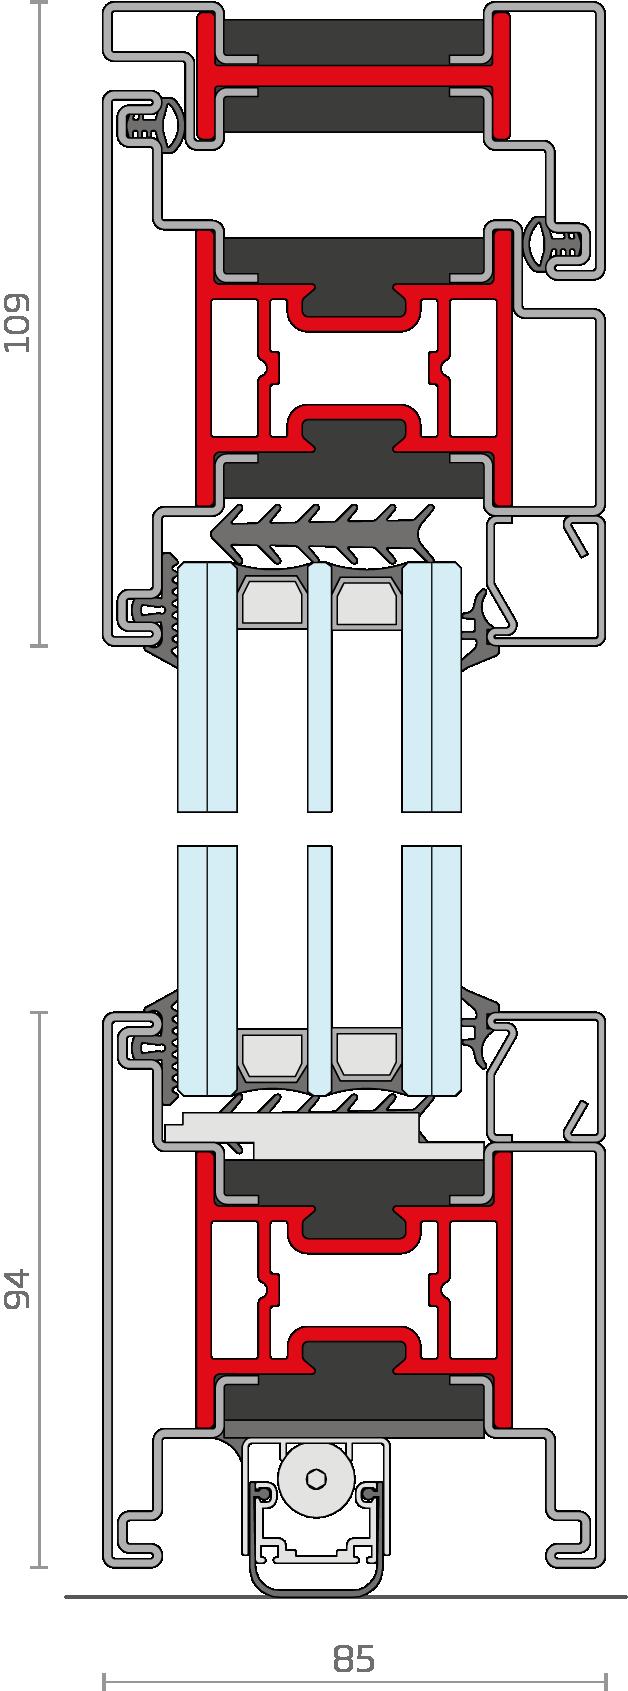 EBE 85_P-AE v